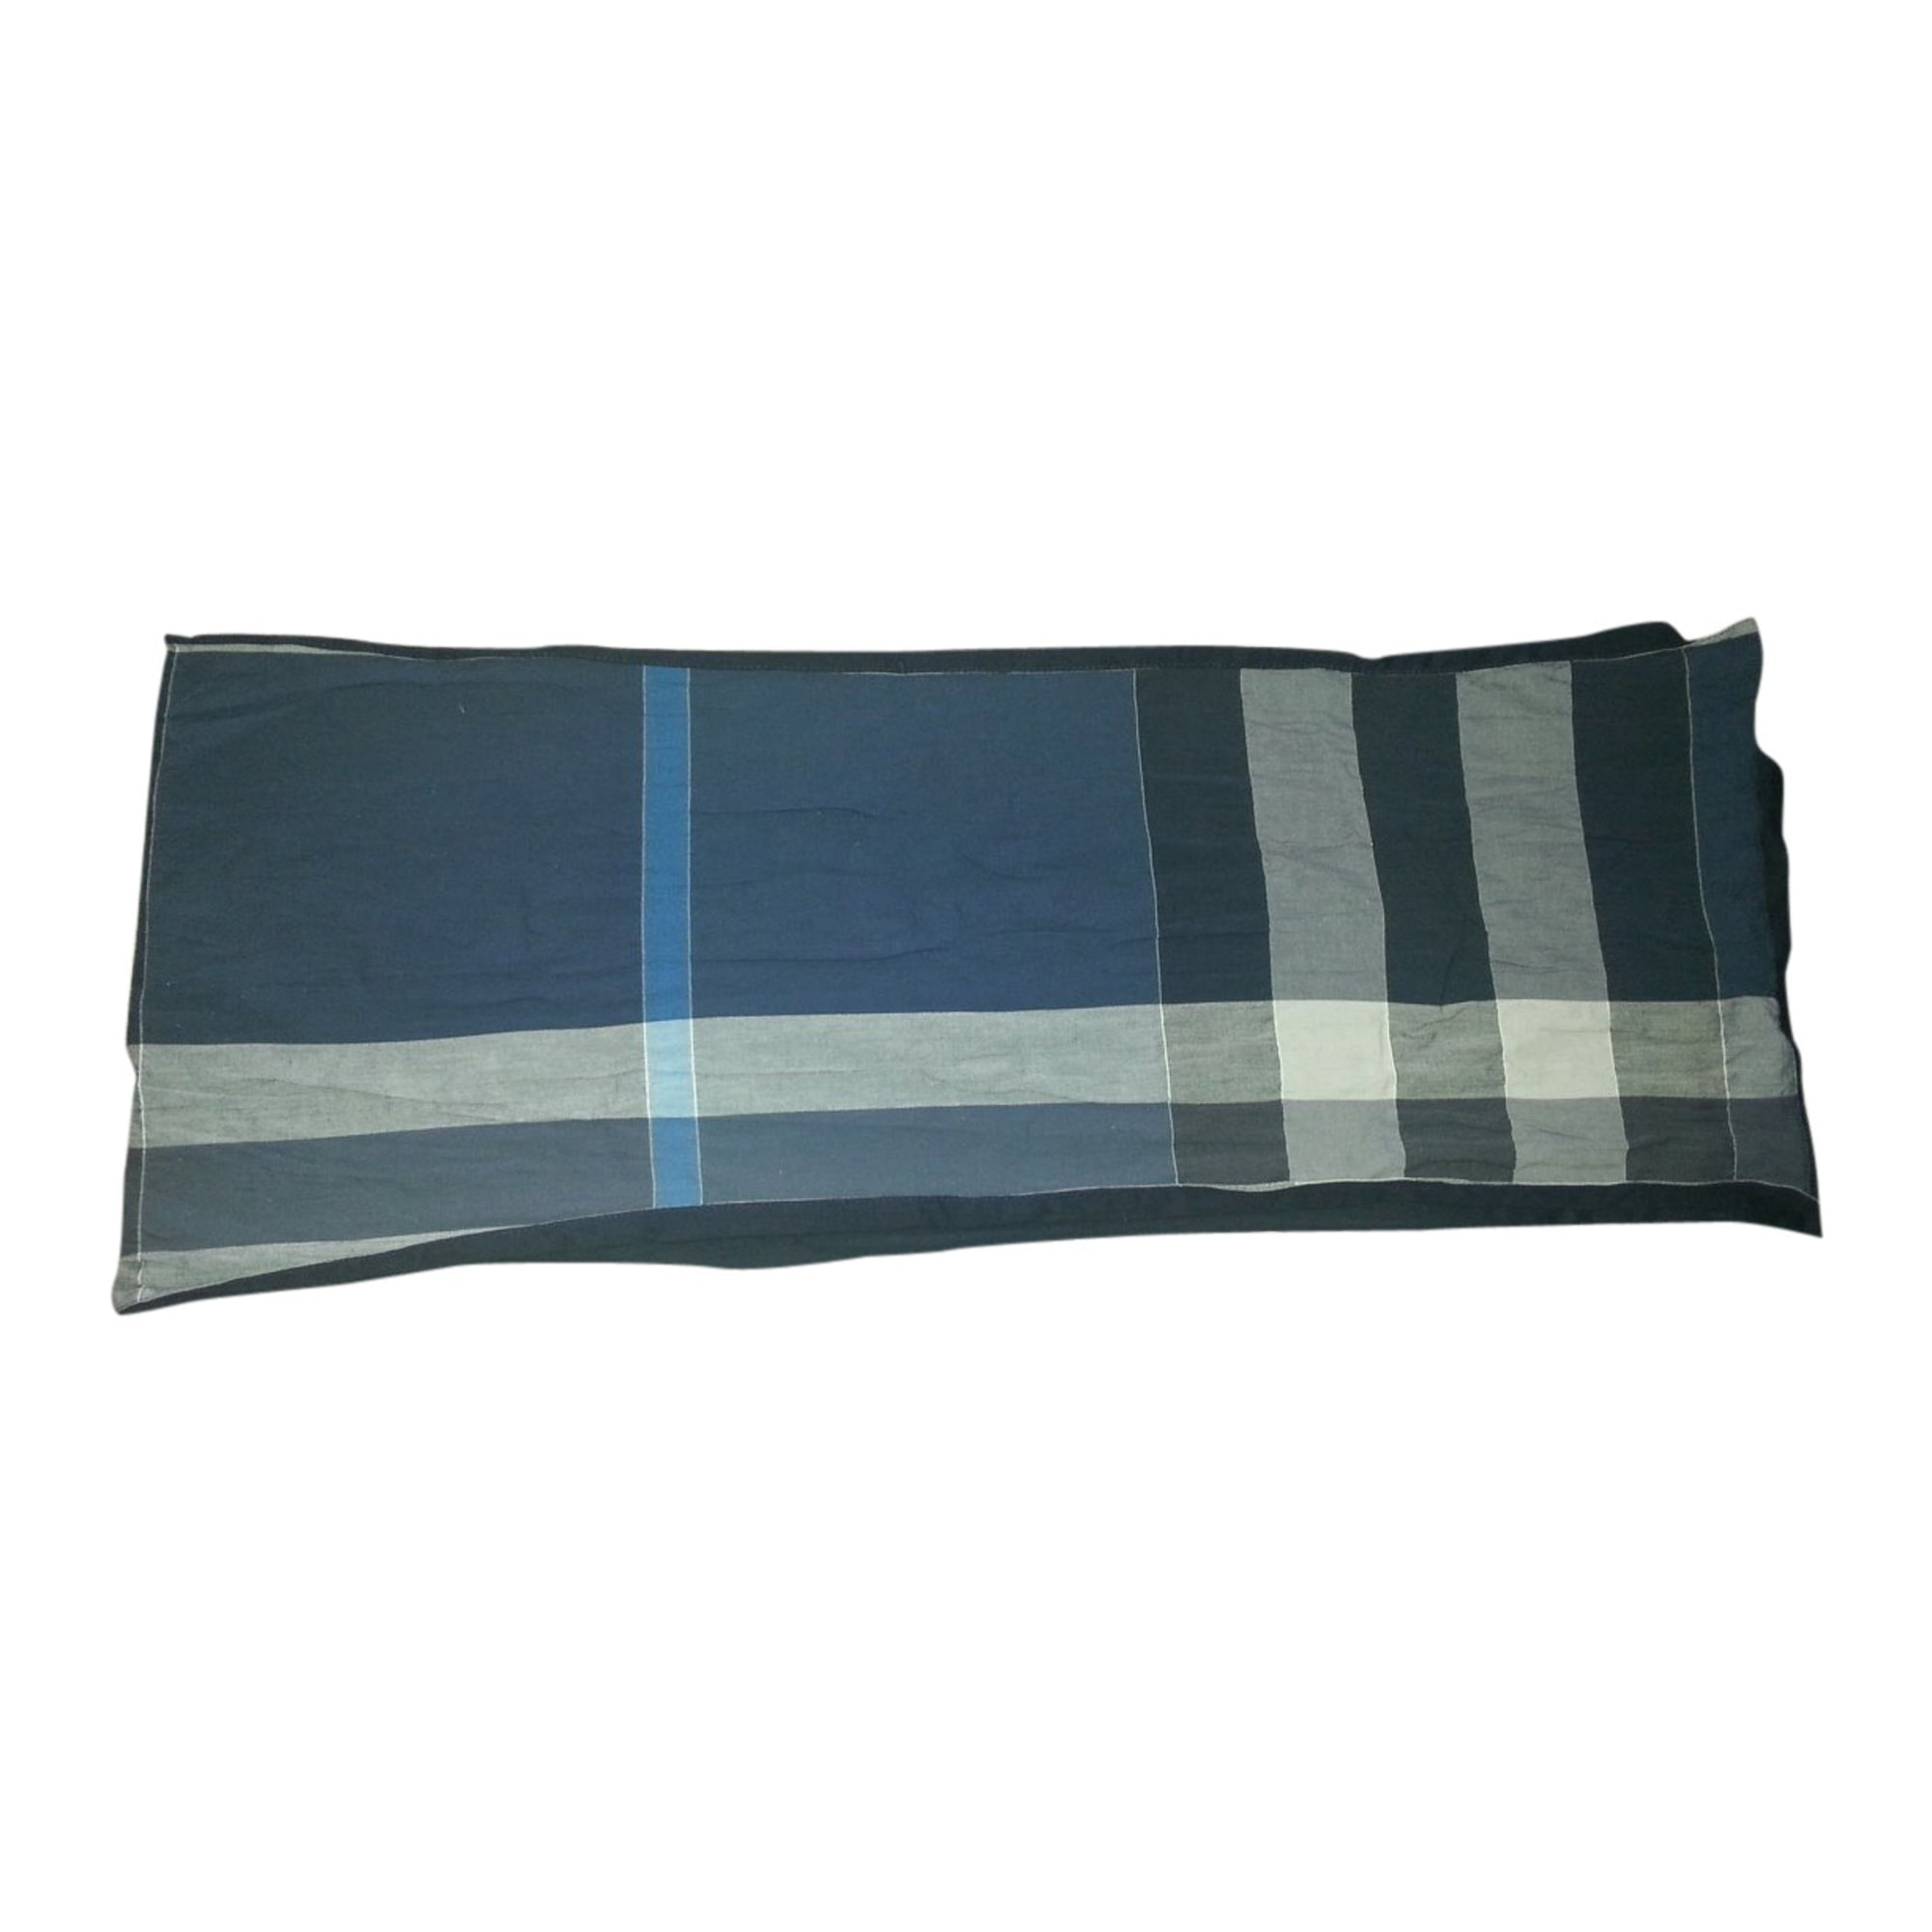 Foulard BURBERRY bleu vendu par D adeline 38285057 - 1729542 f5e4aba9726